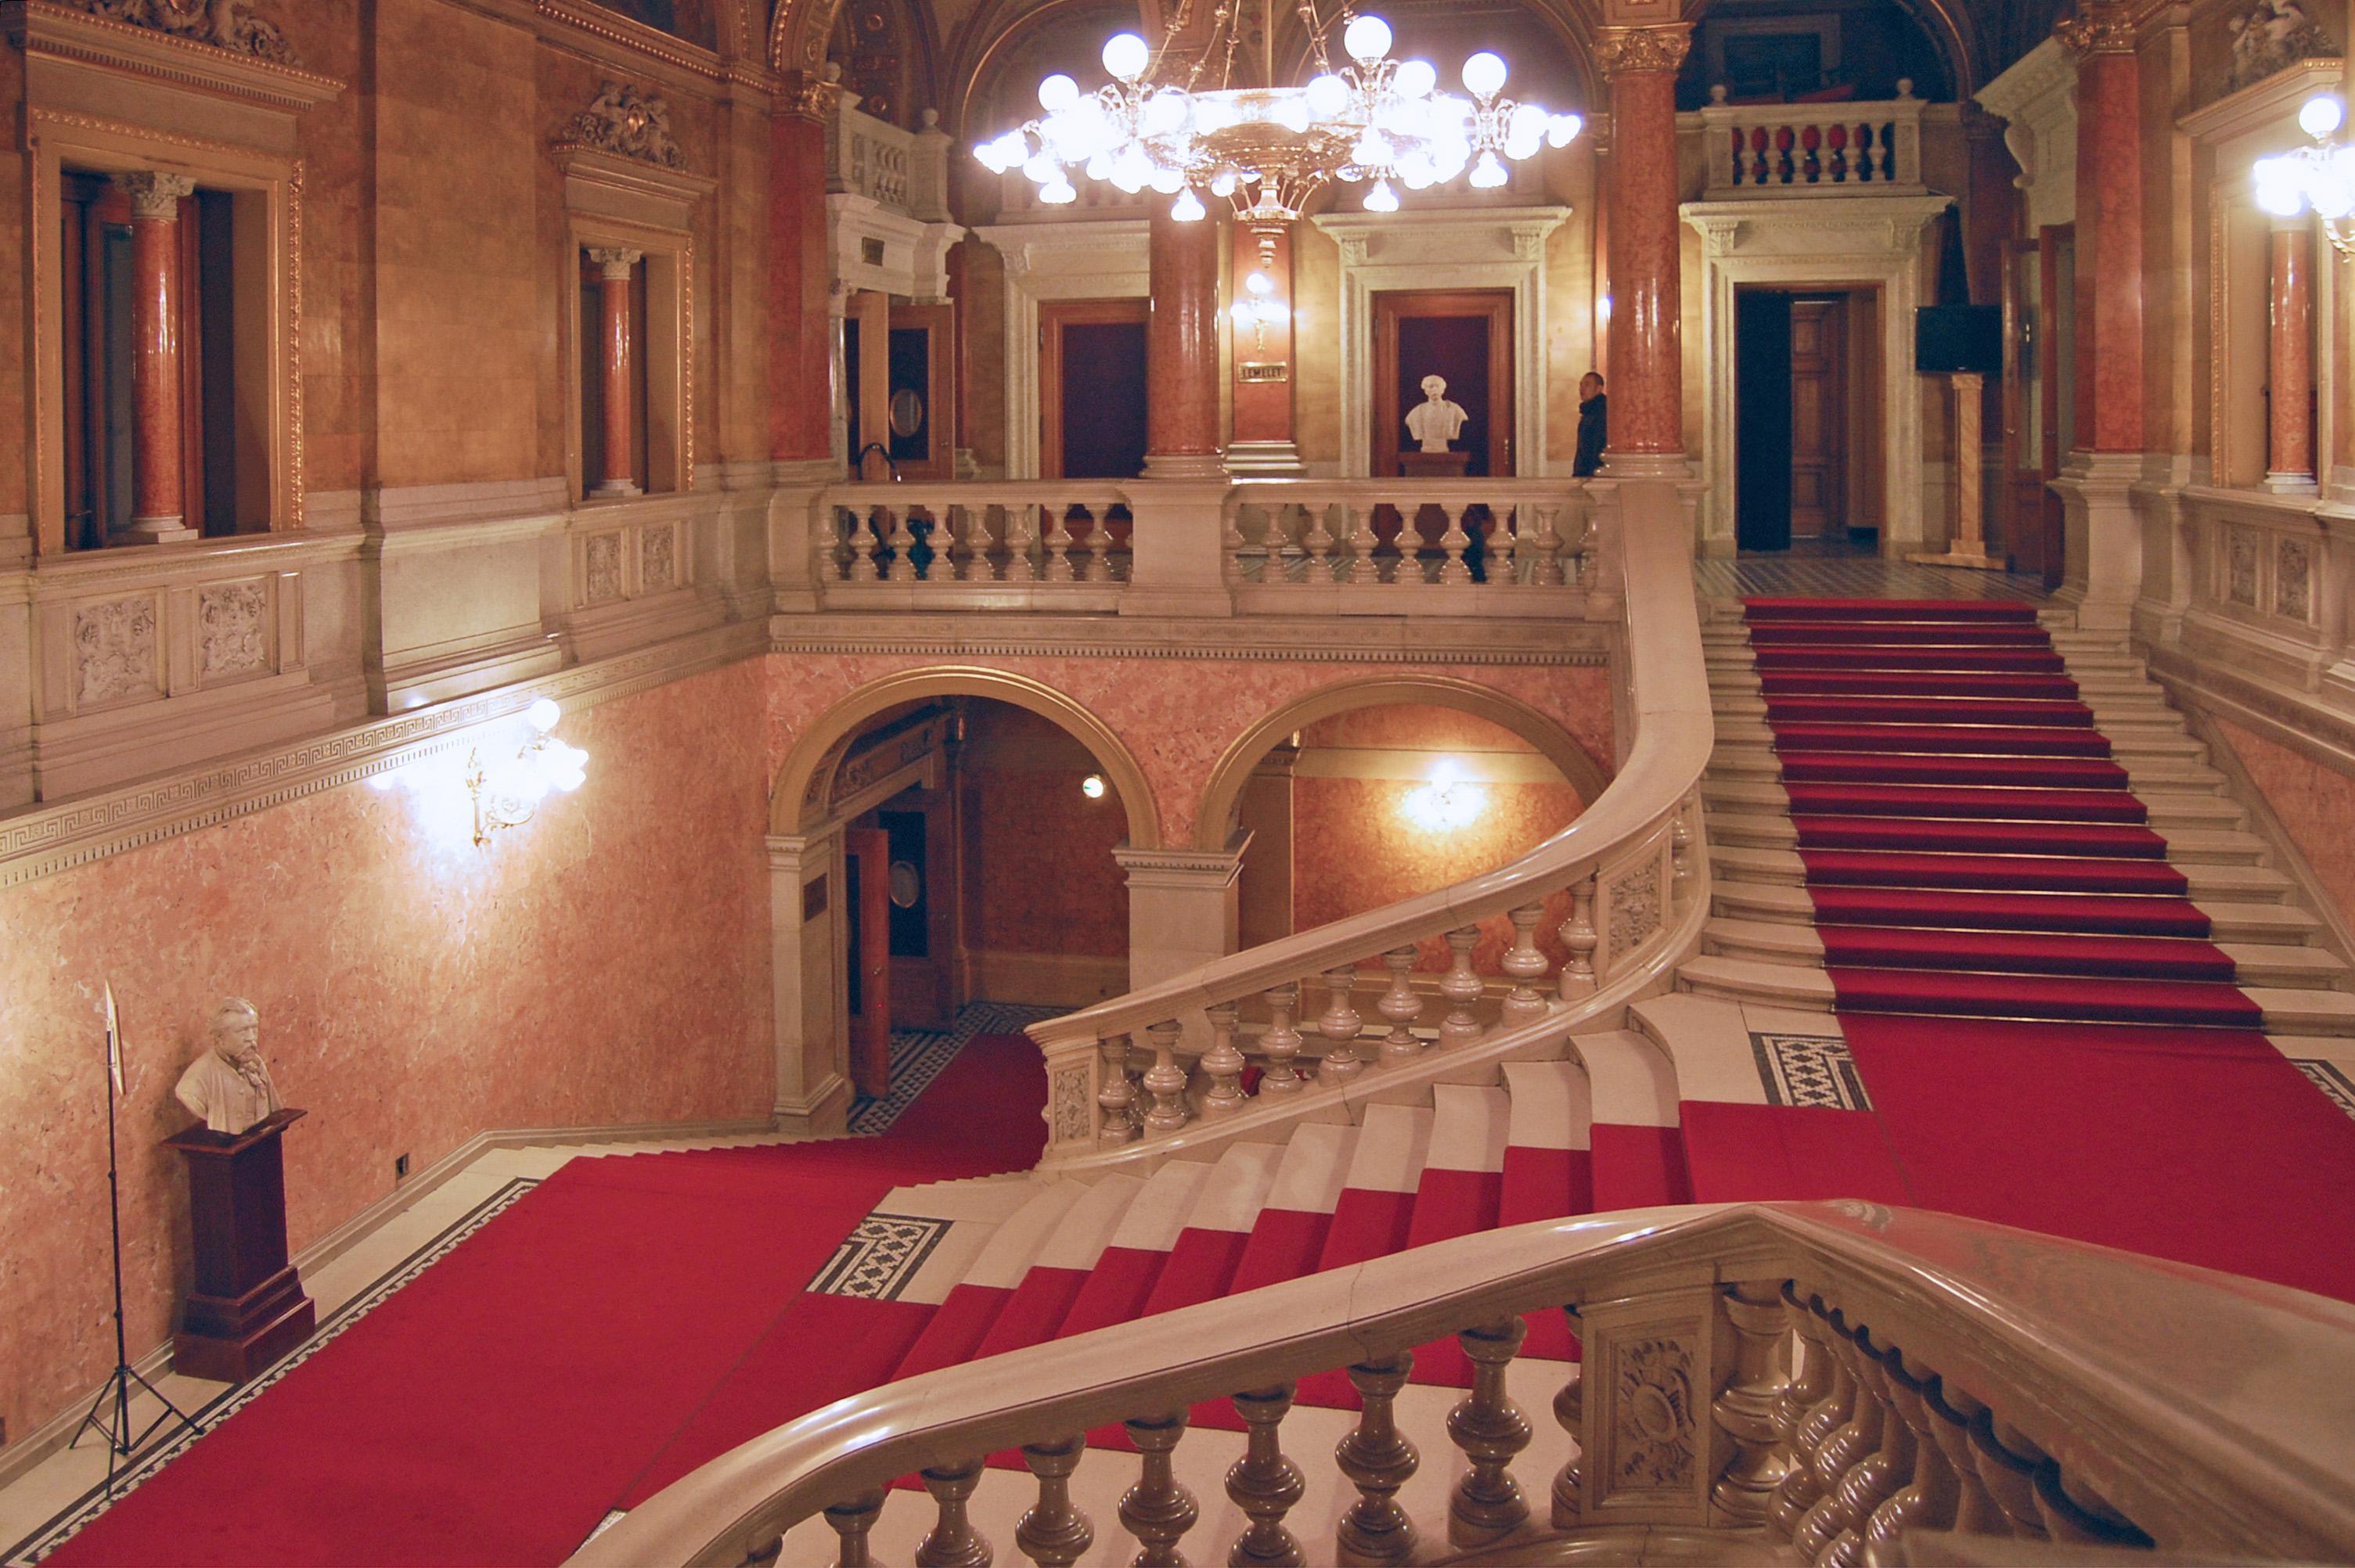 Magyar Állami Operaház (or The Hungarian State Opera House